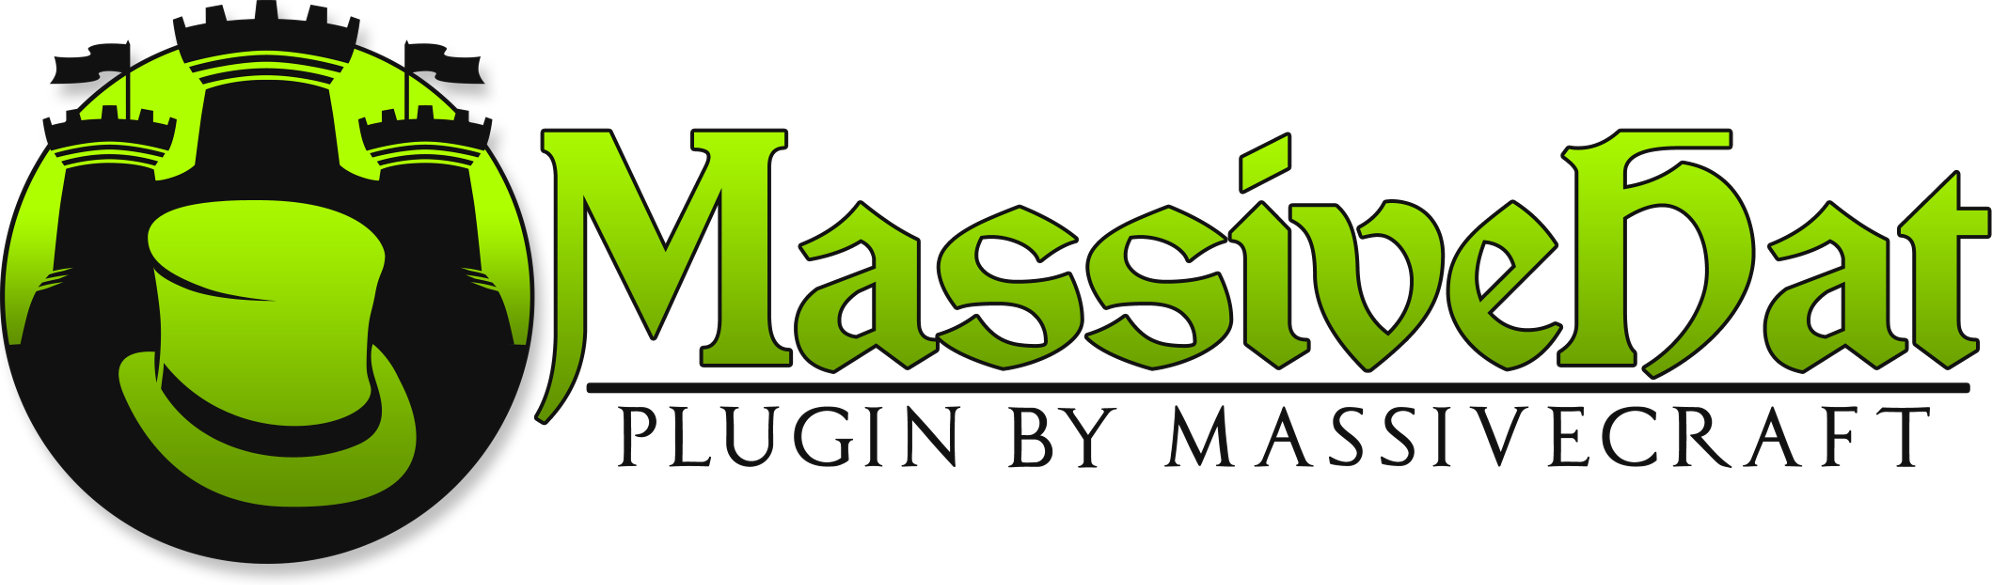 MassiveHat Logotype